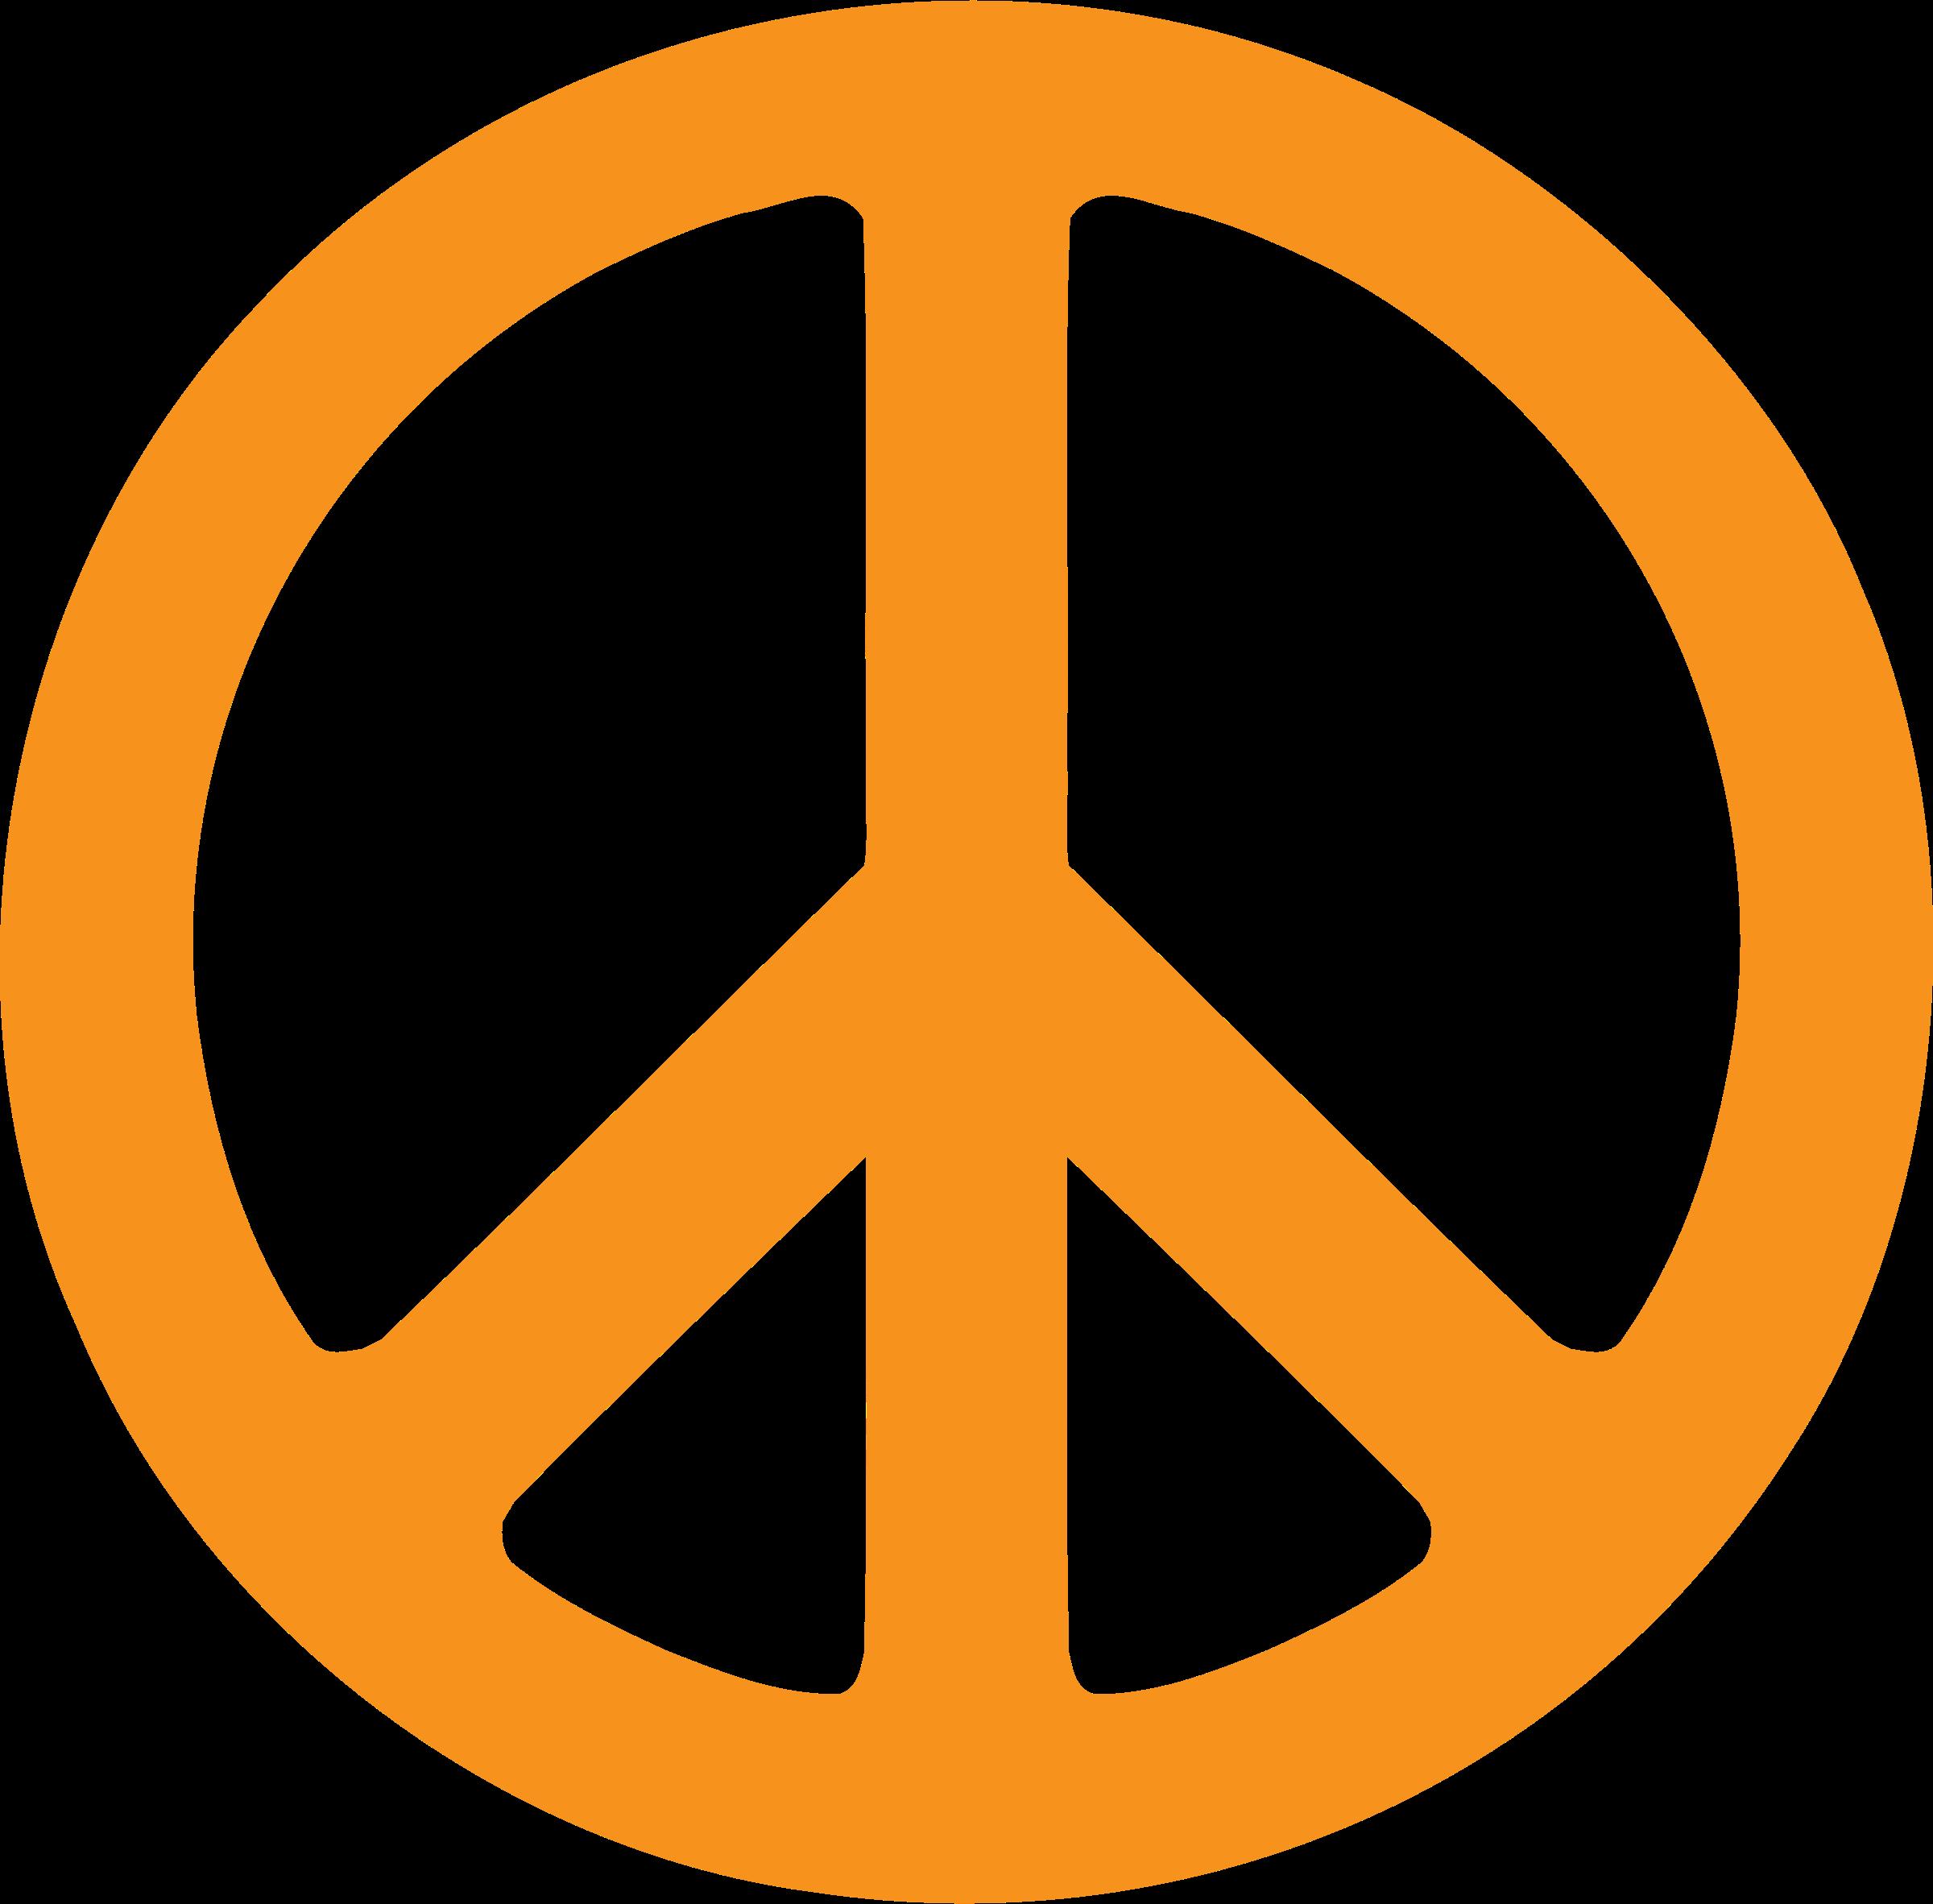 Symbol png transparent hd. Peace clipart peaceful life